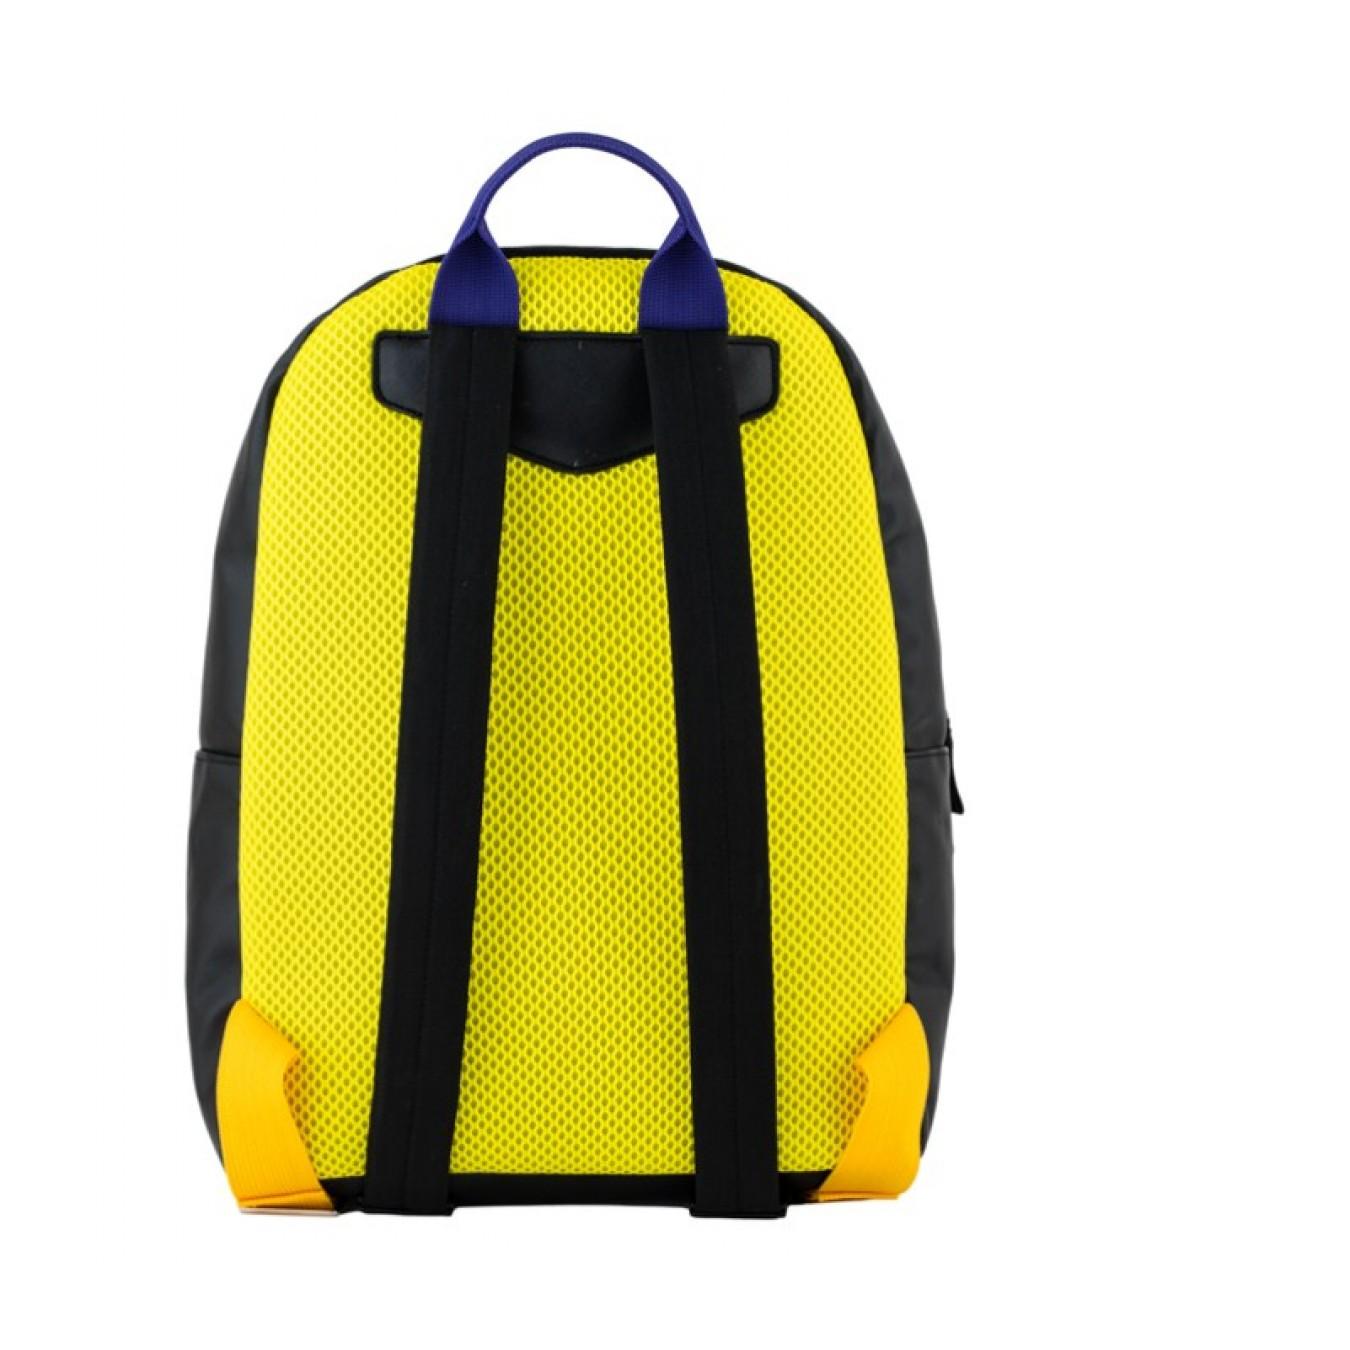 8f5592120a ... Vespa τσάντα πλάτης V-Stripes Κίτρινη VESPA ΓΙΑ ΤΟΝ ΑΝΑΒΑΤΗ ...